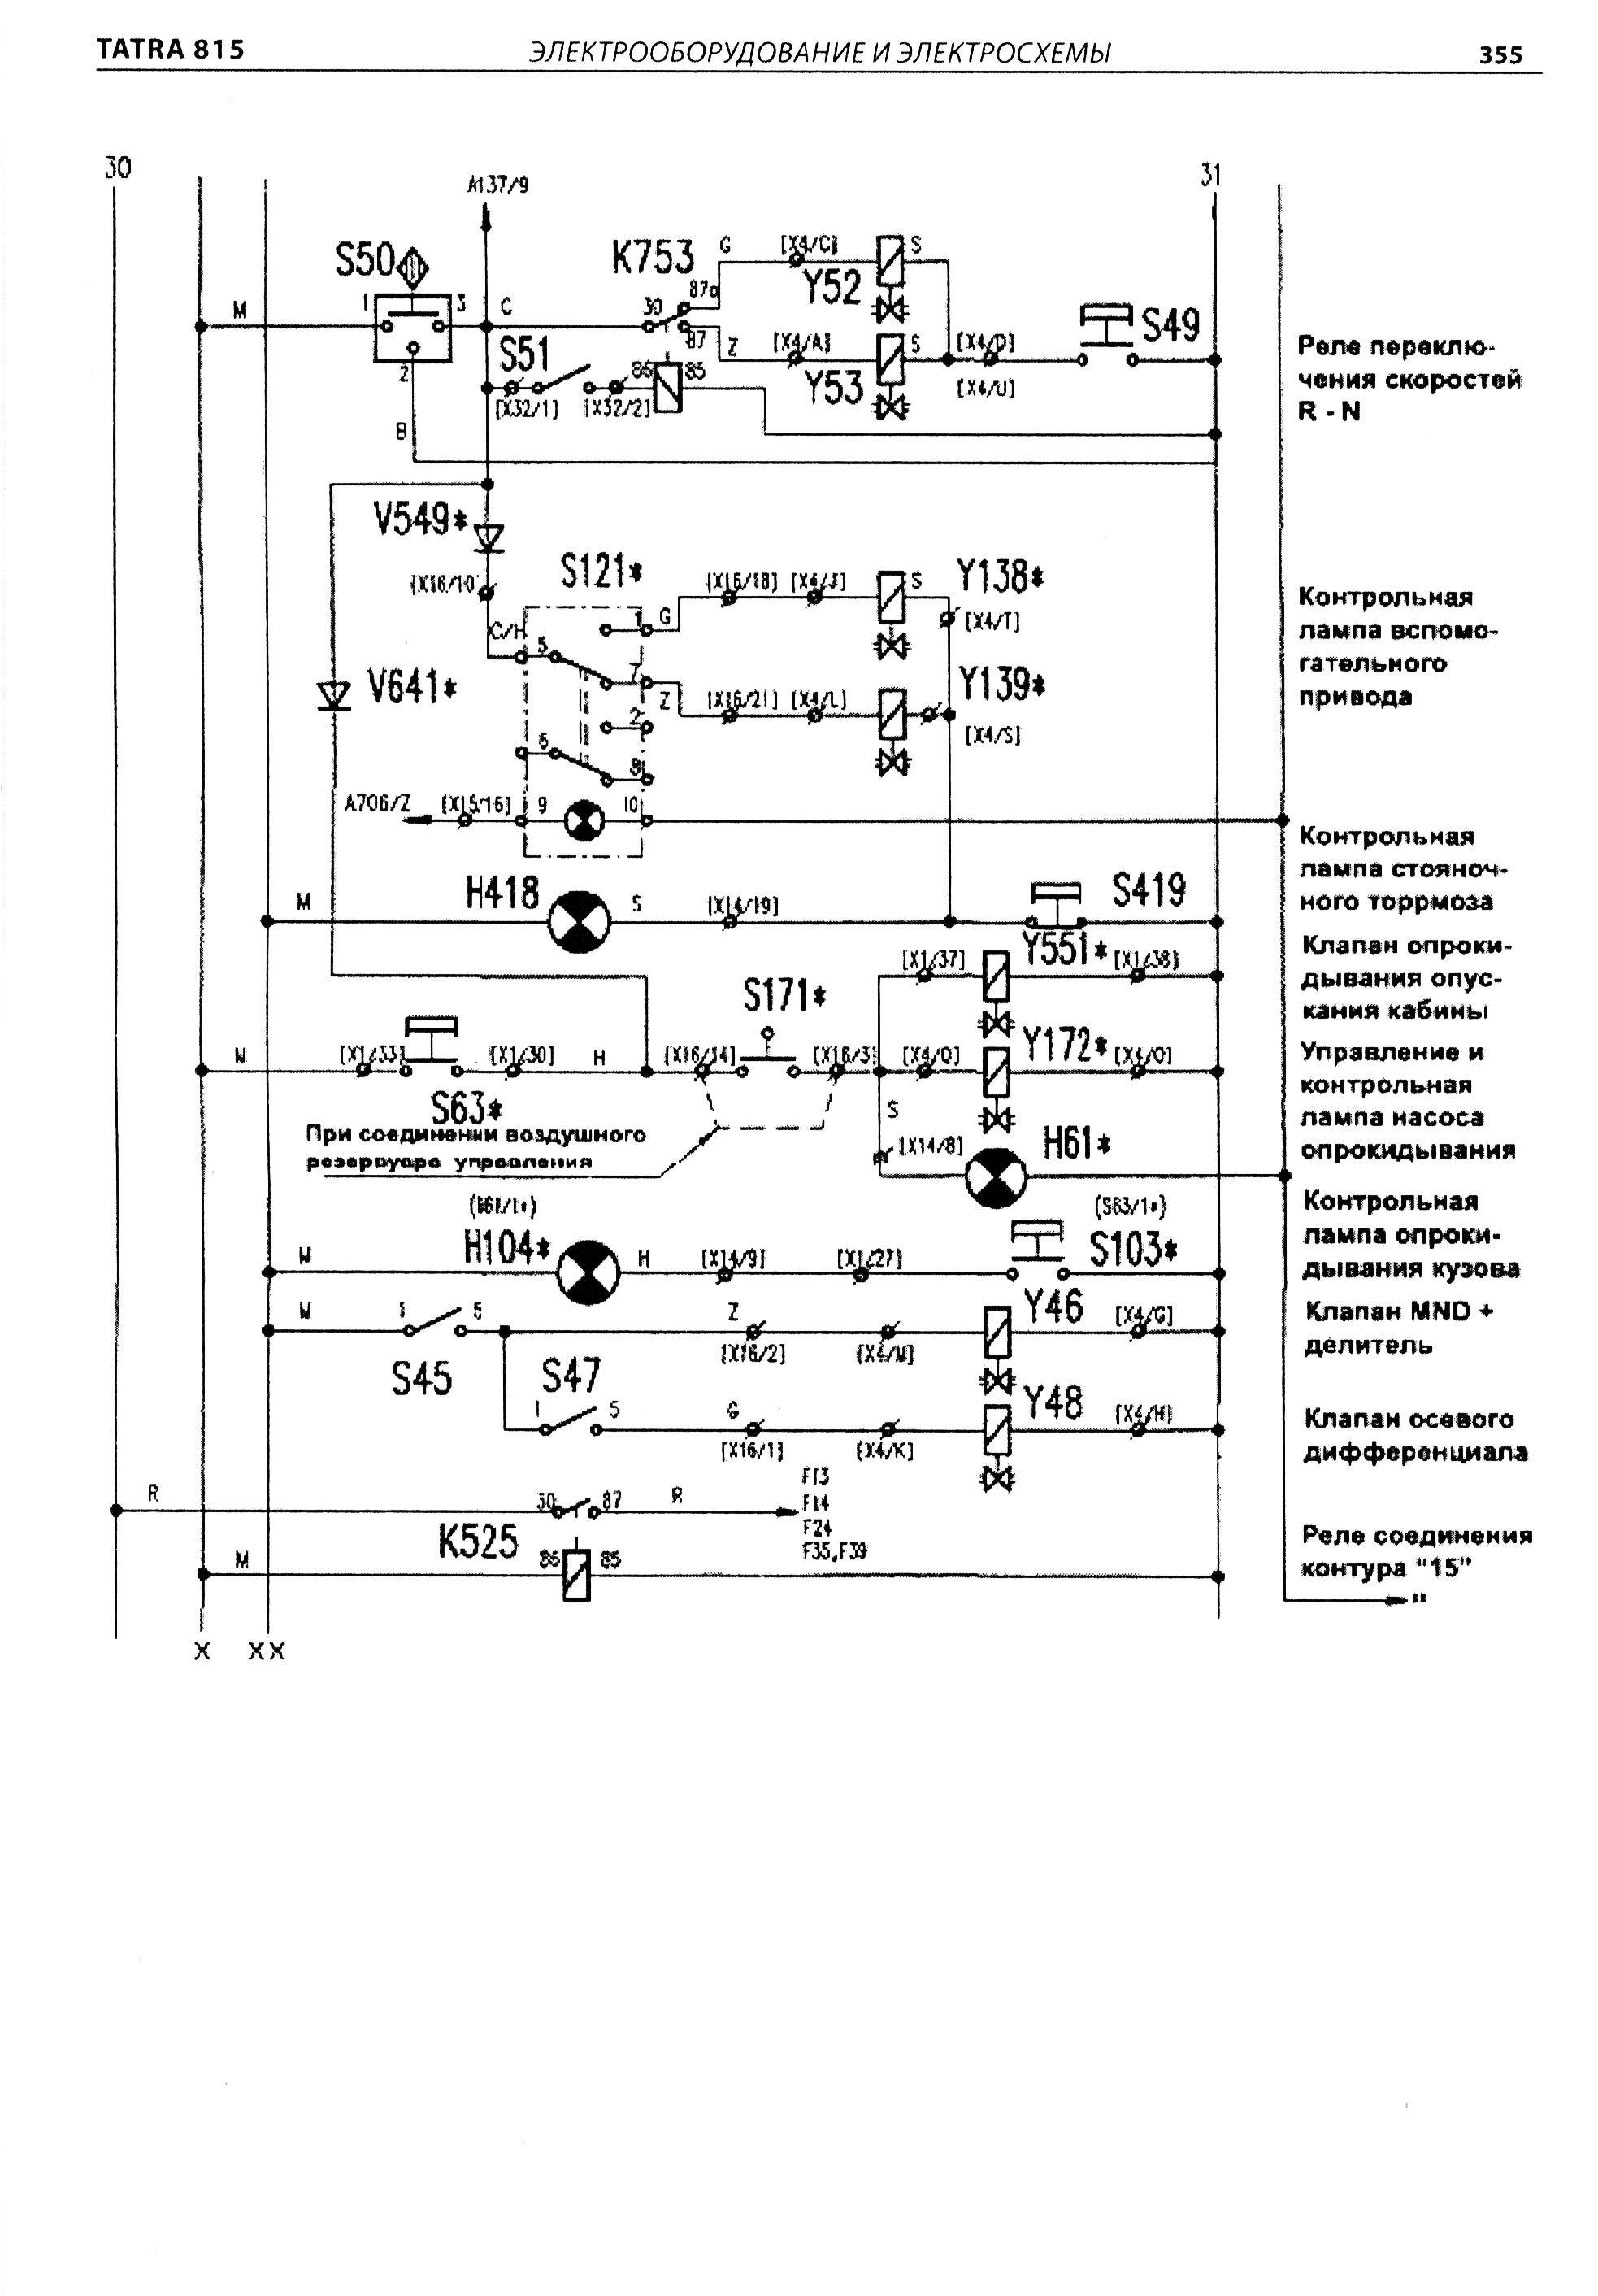 Схема электрооборудования татра-815